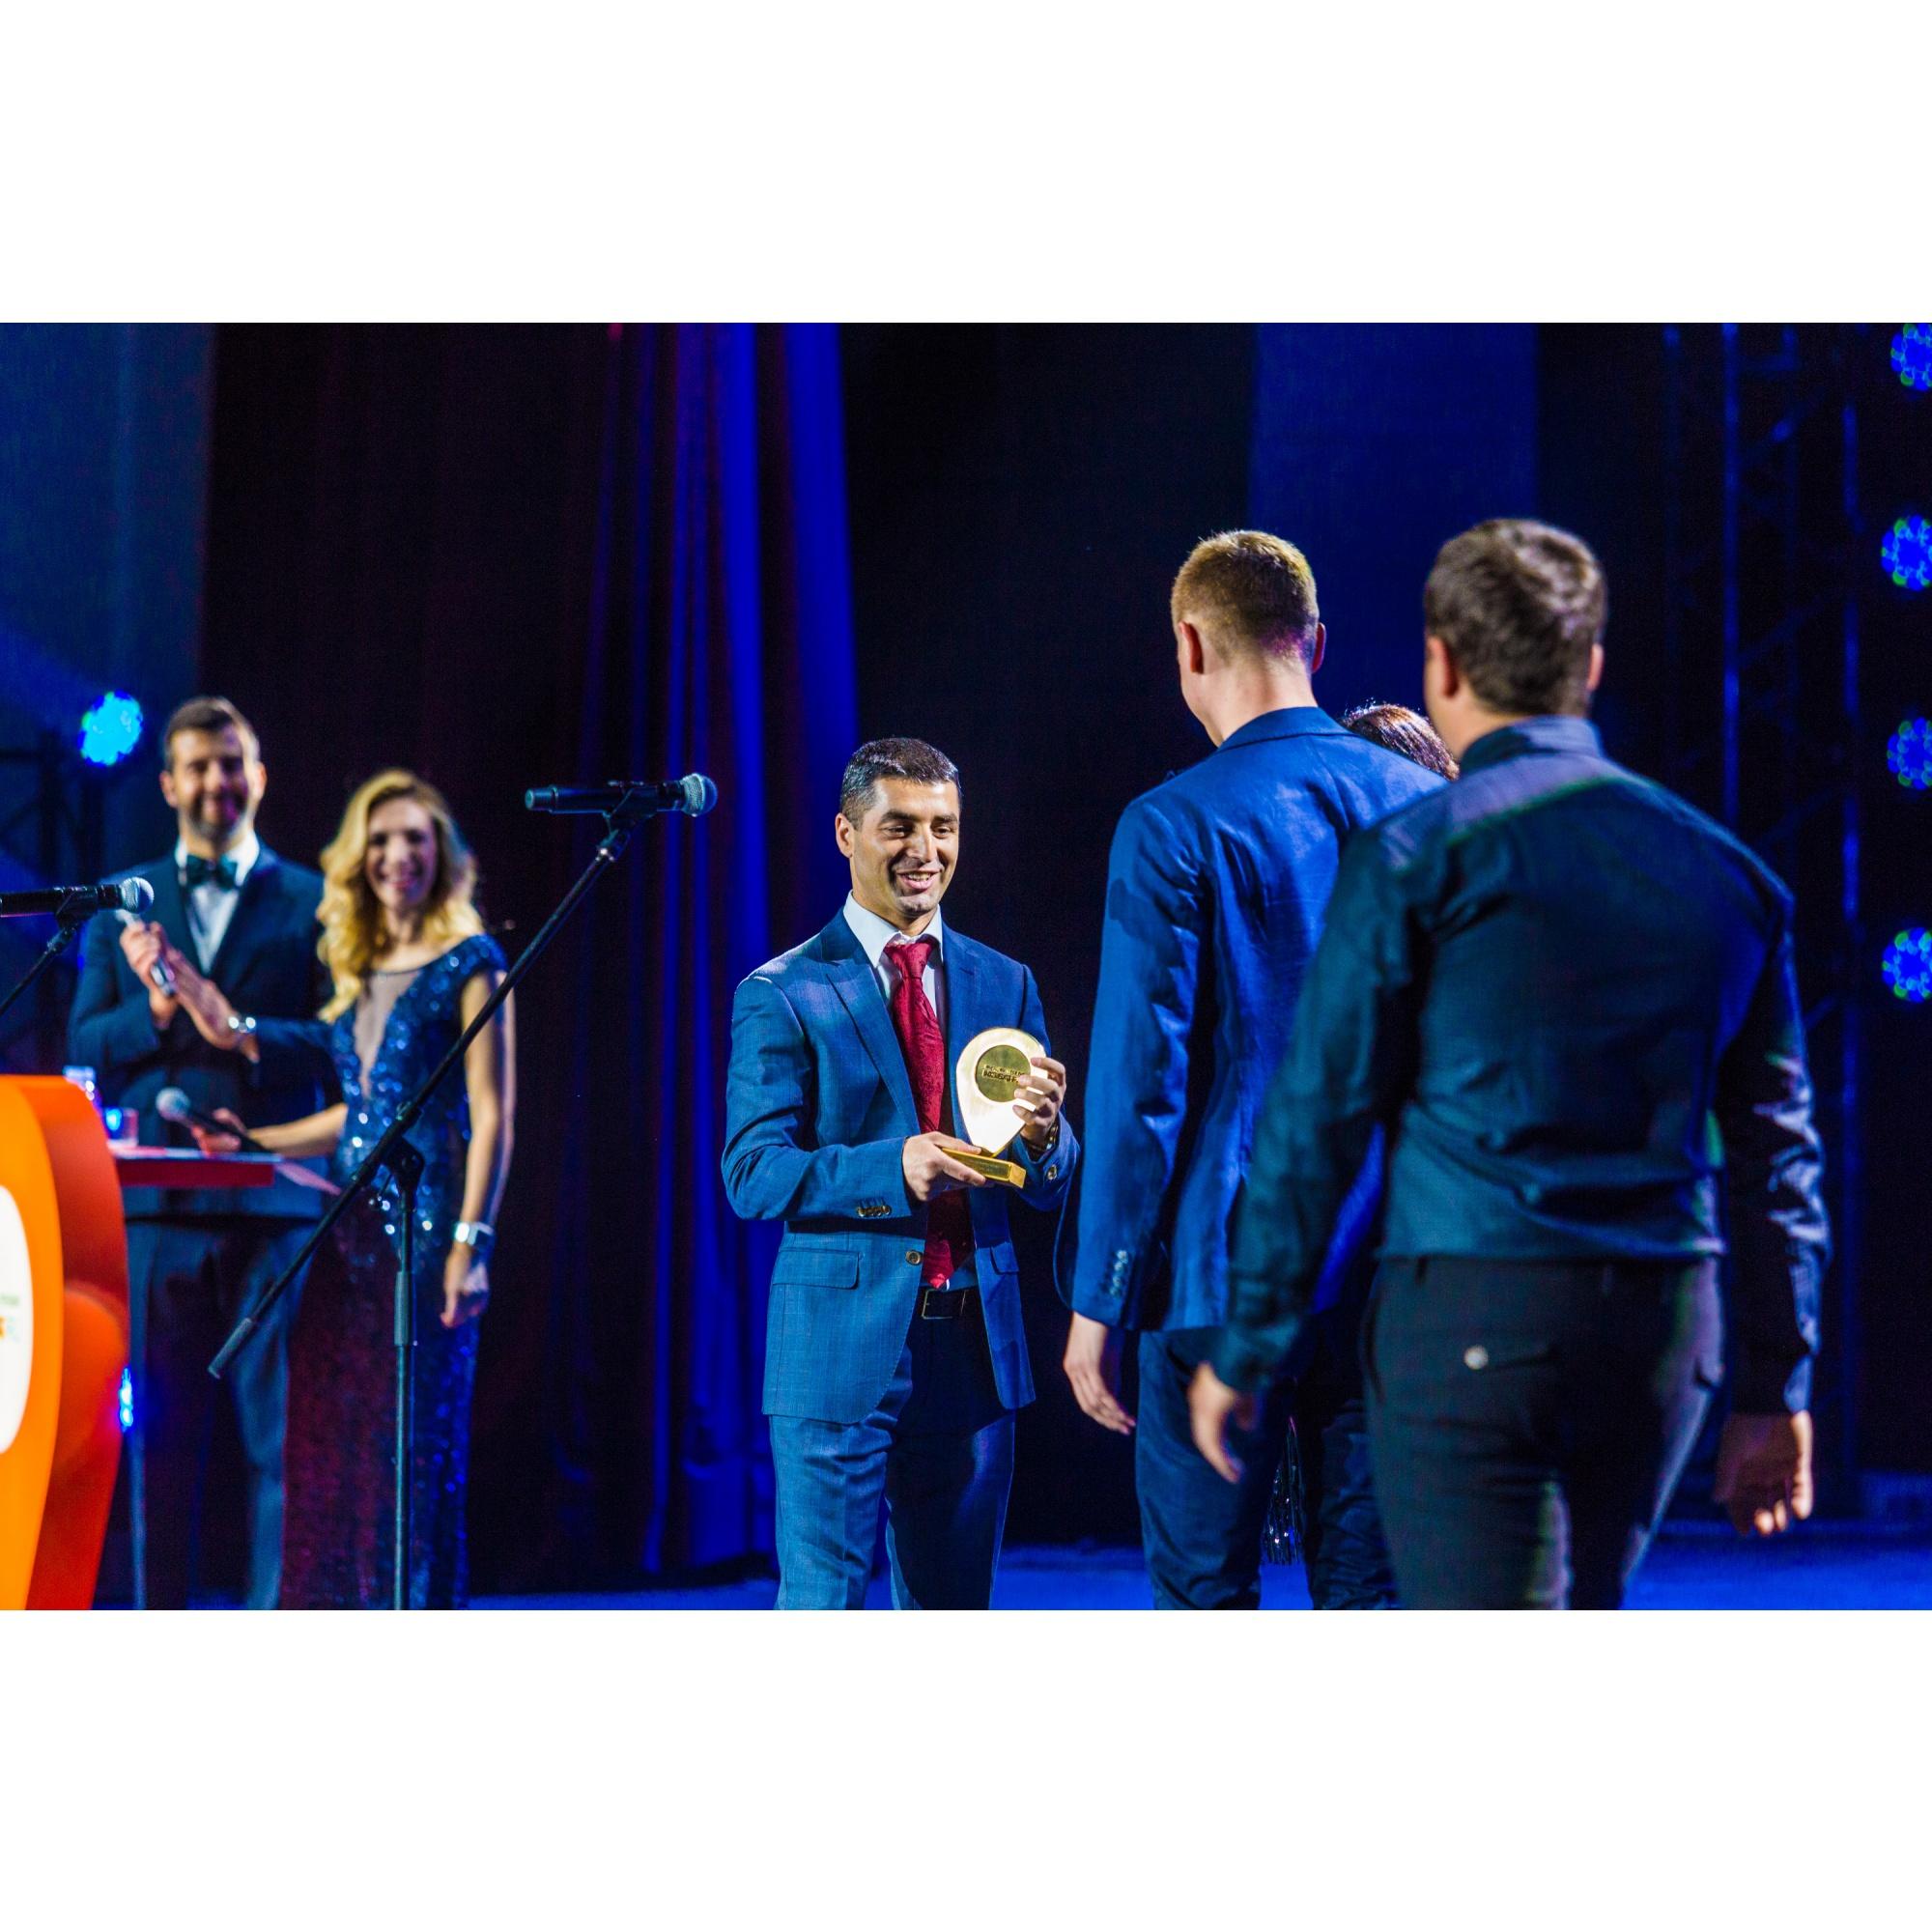 Михаил Алоян наградил фитнес-центр года